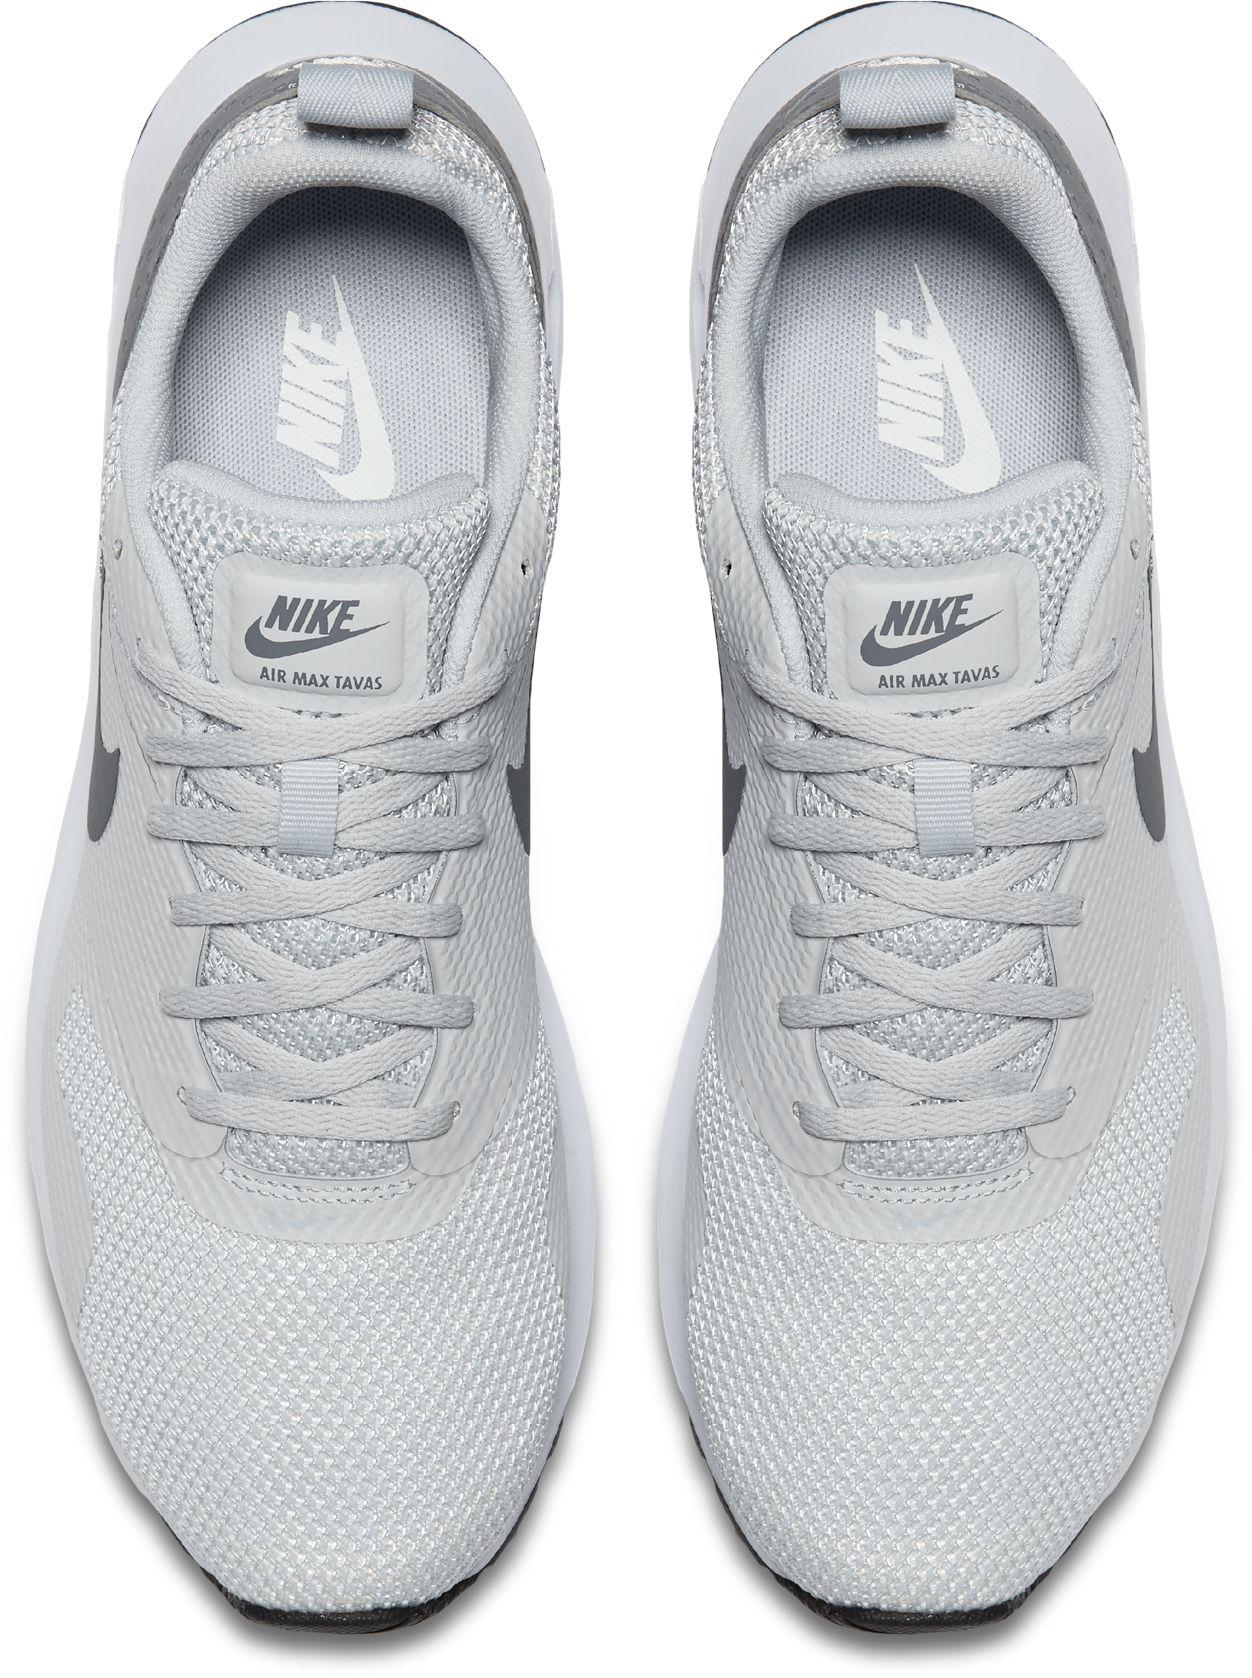 63da914f34 Lyst - Nike Air Max Tavas Shoes in White for Men